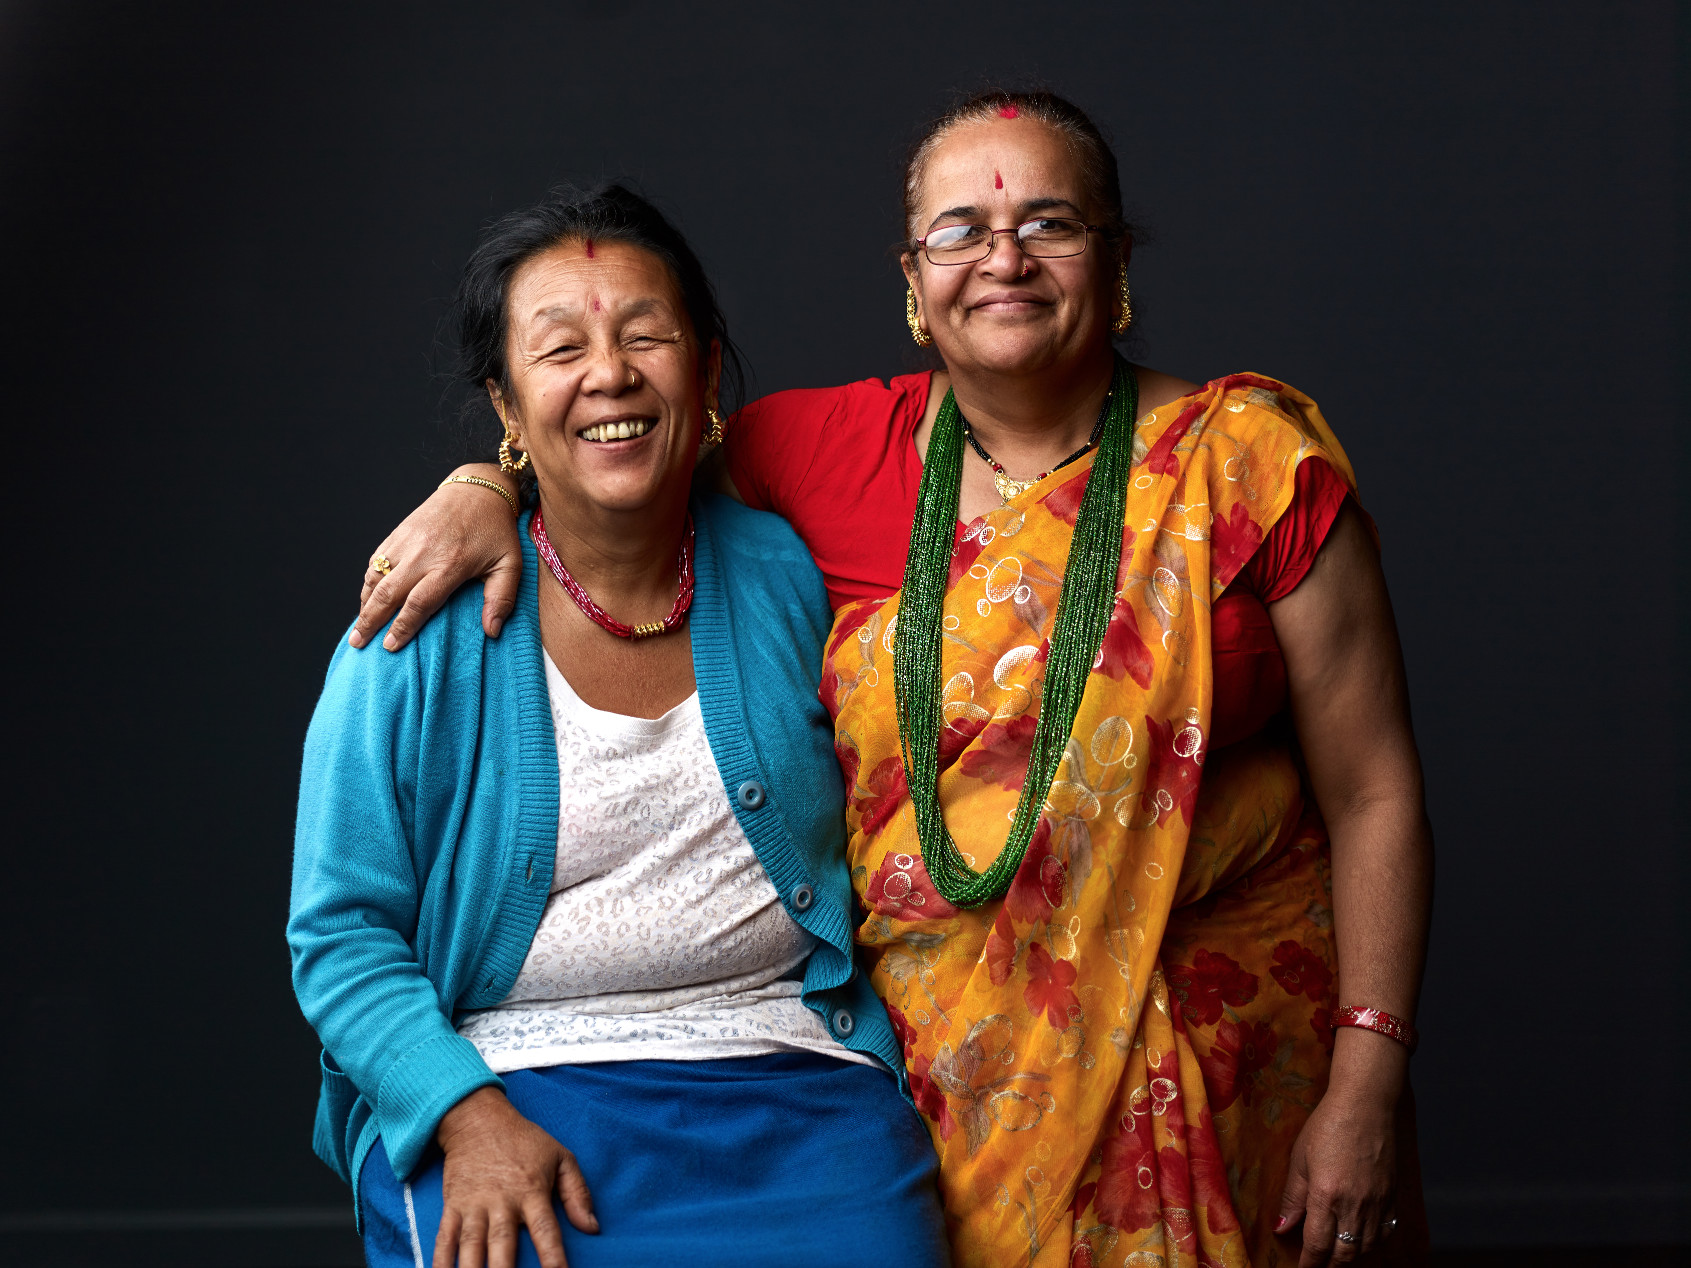 bhakti and phul portrait.jpg